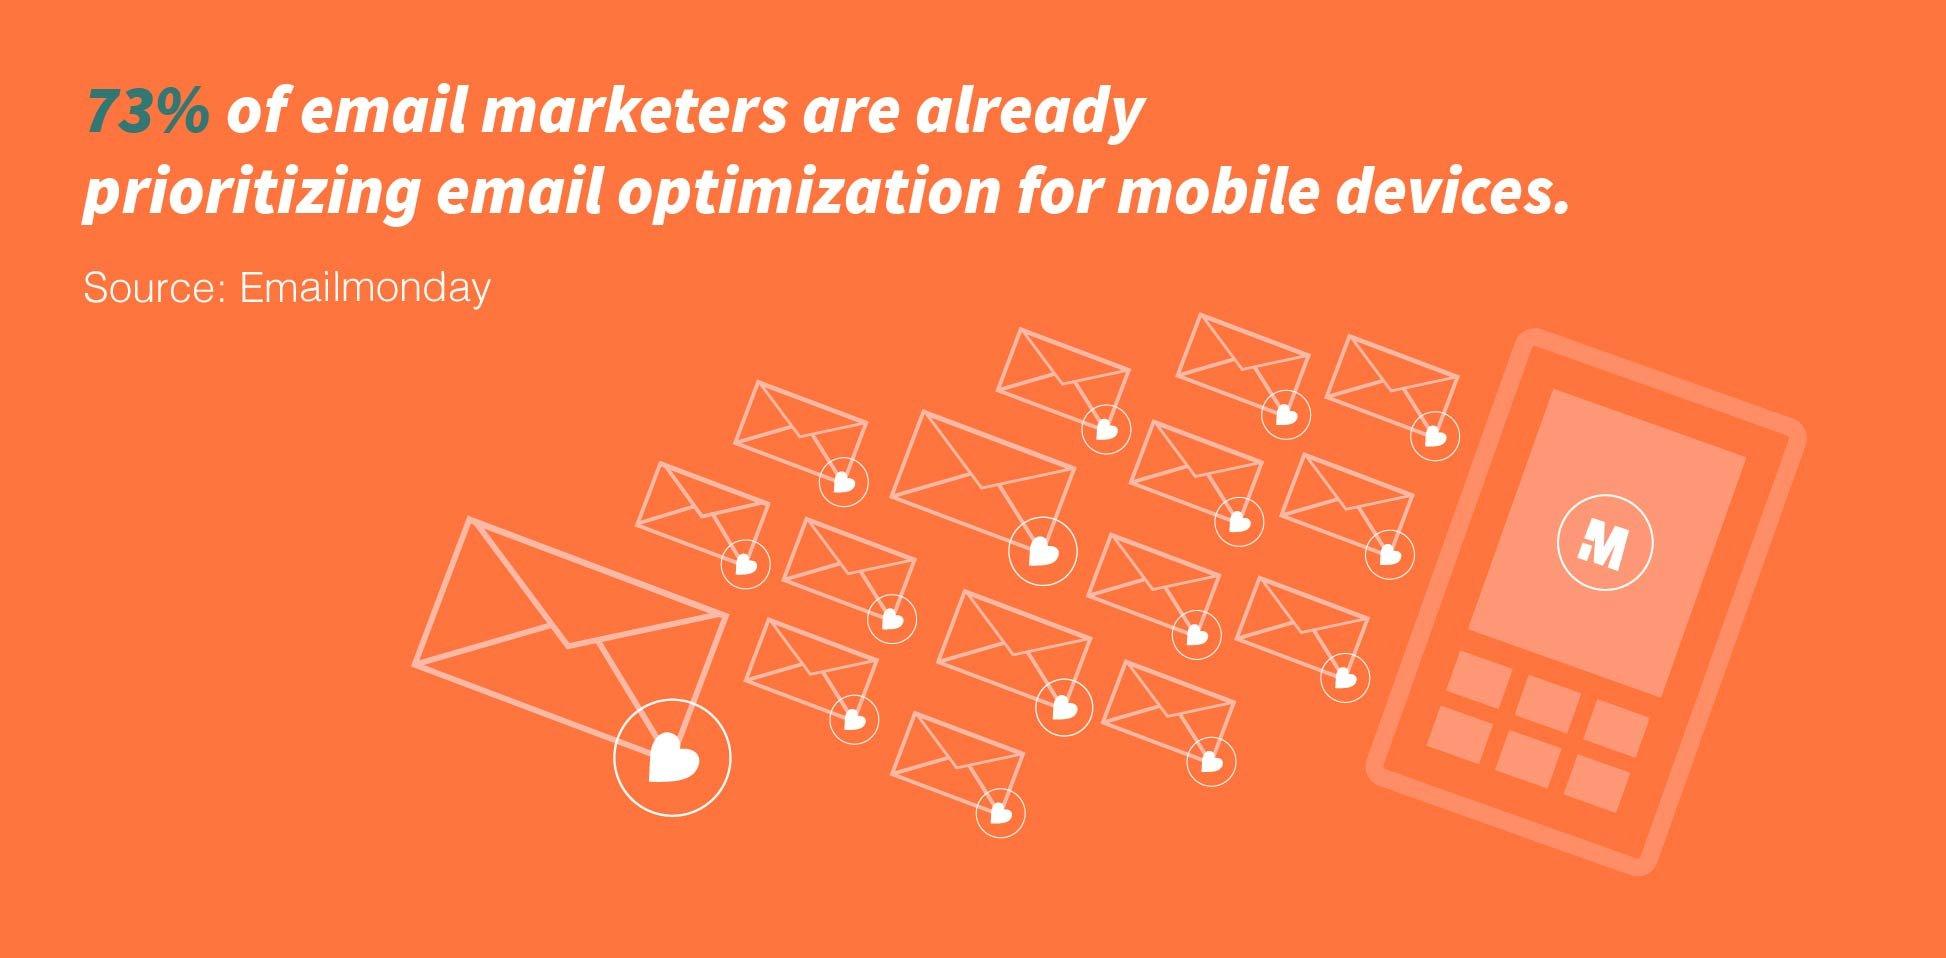 MS_Agency_Blog_8_Trends_in_Digital_Marketing_JAN_IMAGES_4